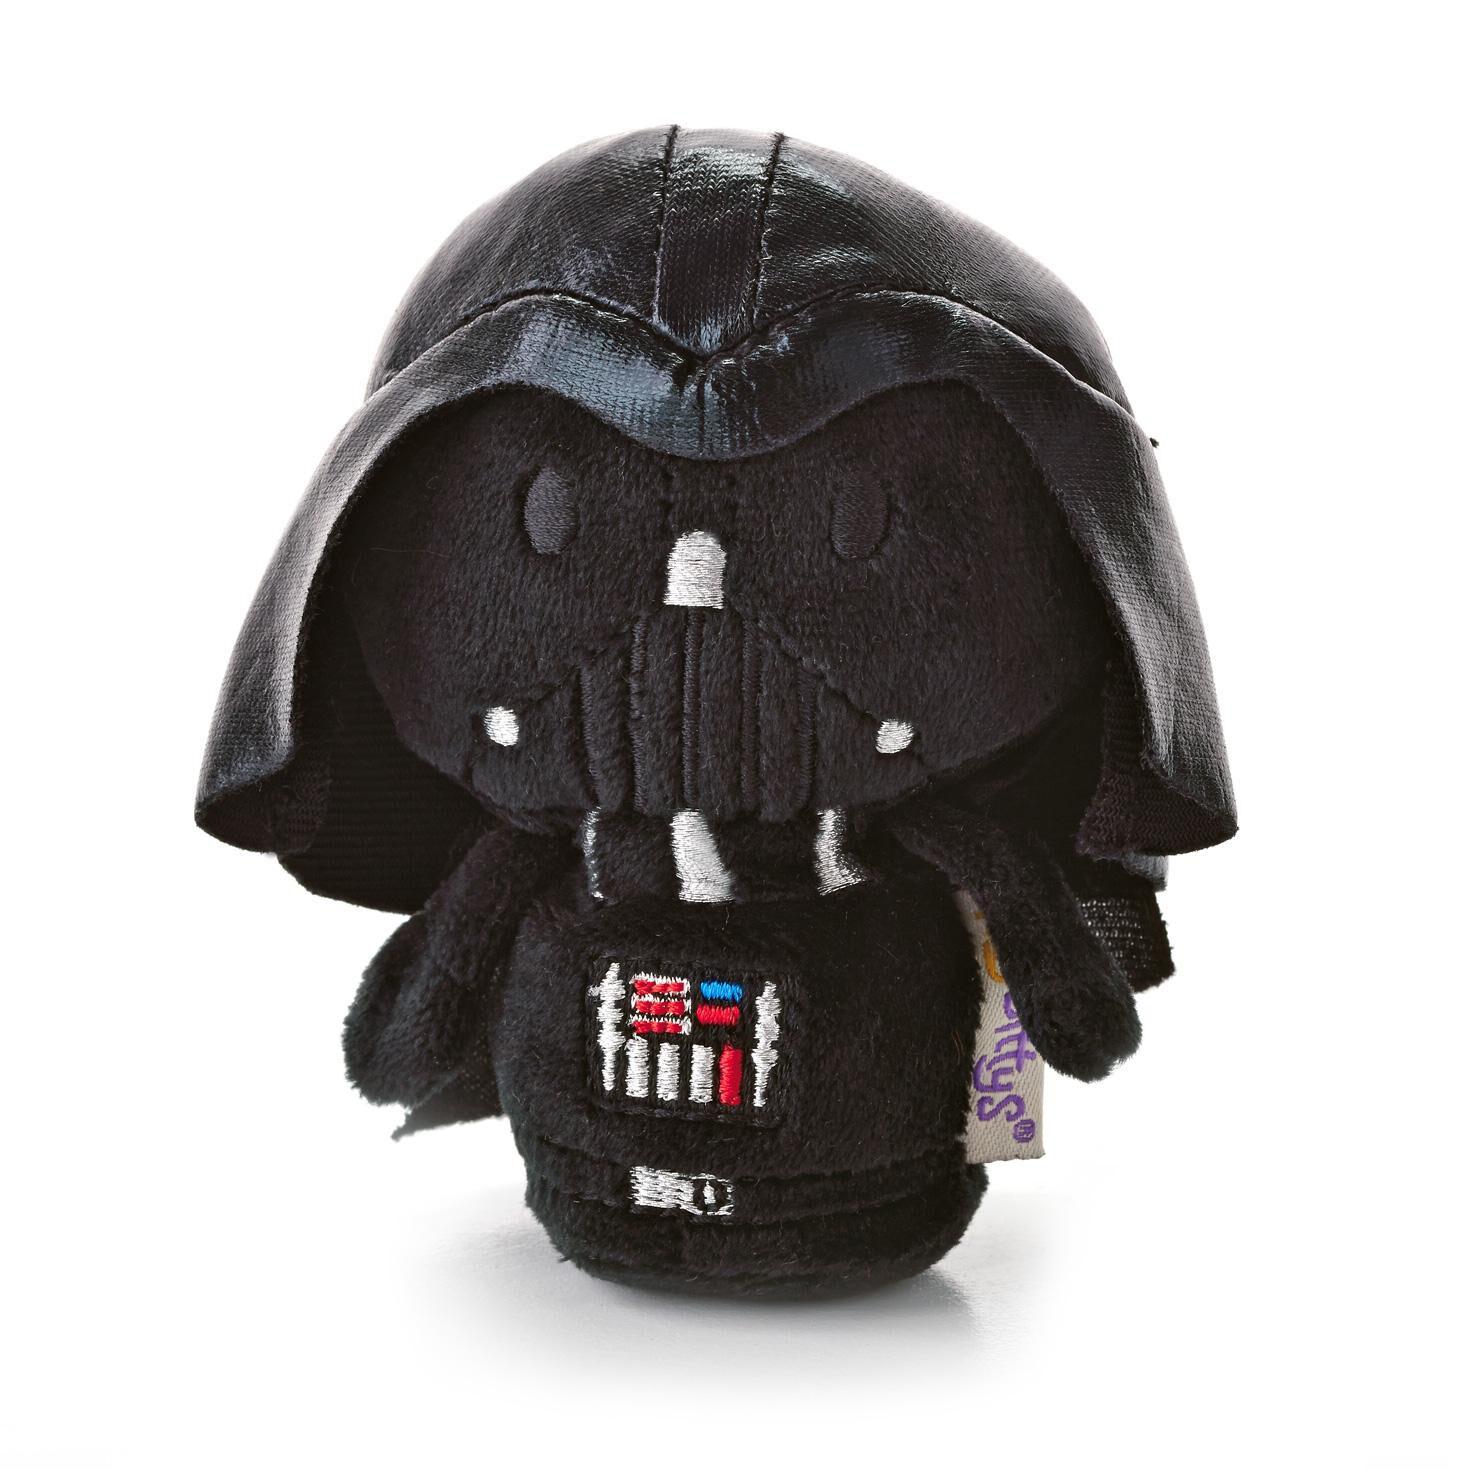 Itty Bittys® Star Wars Darth Vader™ Stuffed Animal  Itty Bittys®  Hallmark